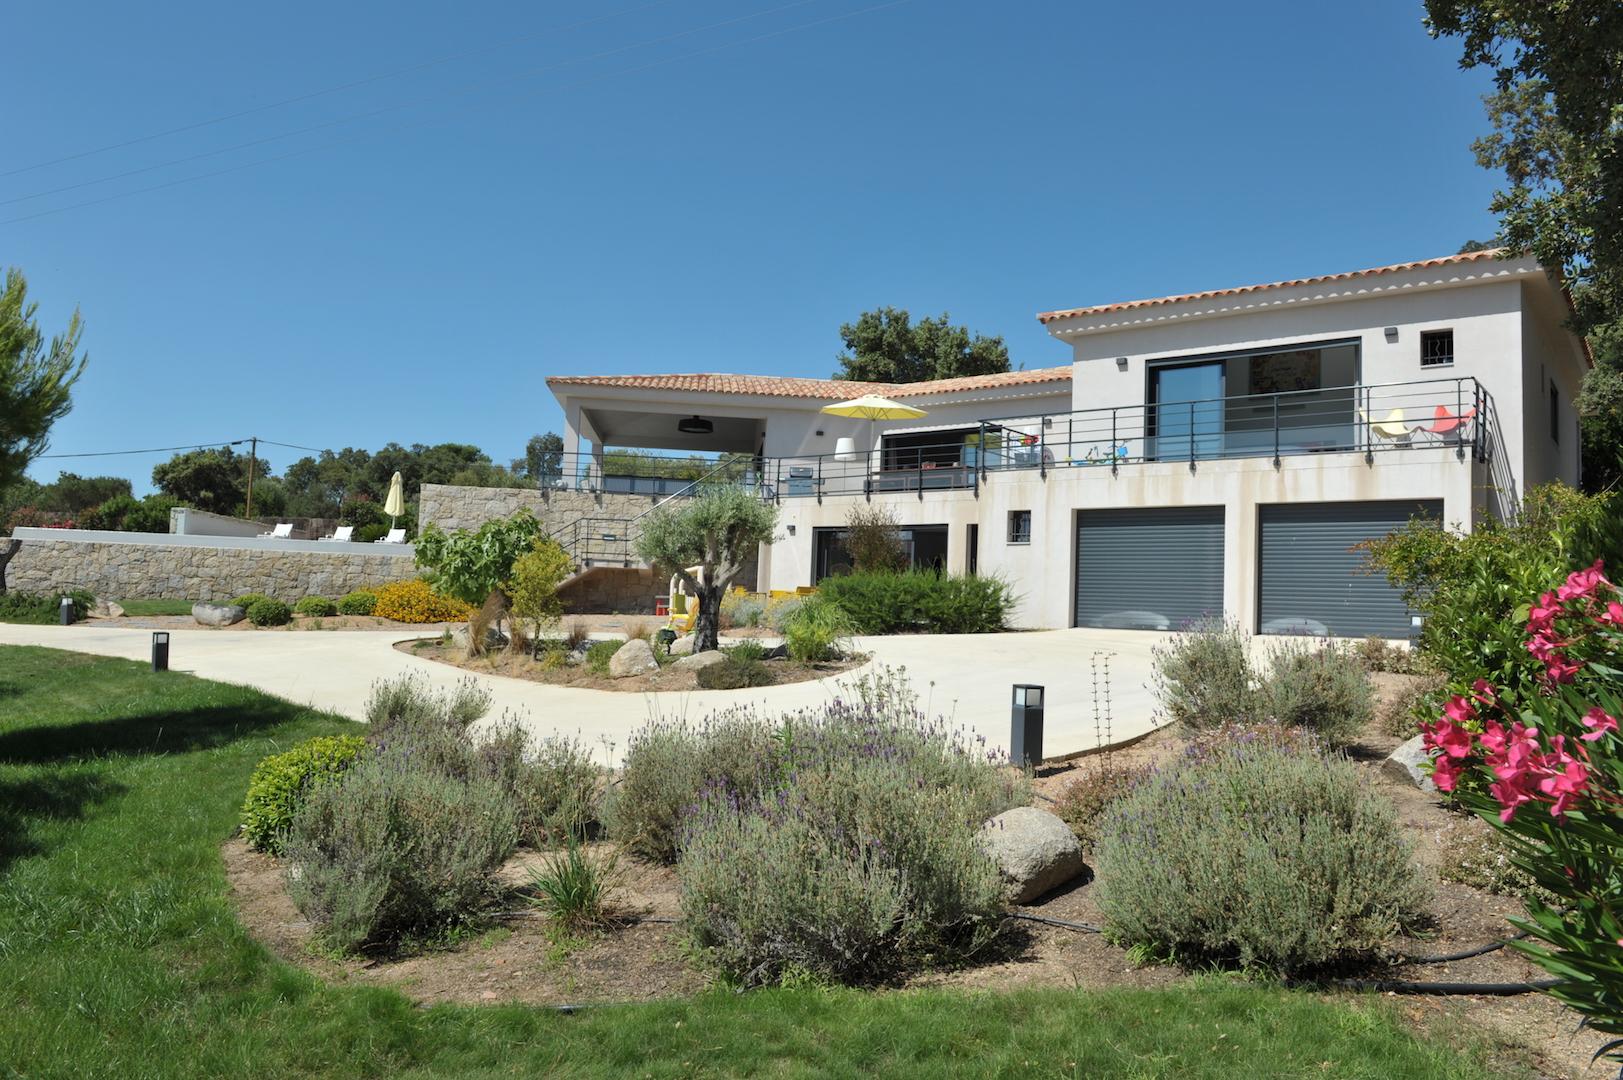 Moins de 200 m pied de la plage de pinarello villa d for Taxe fonciere garage prix